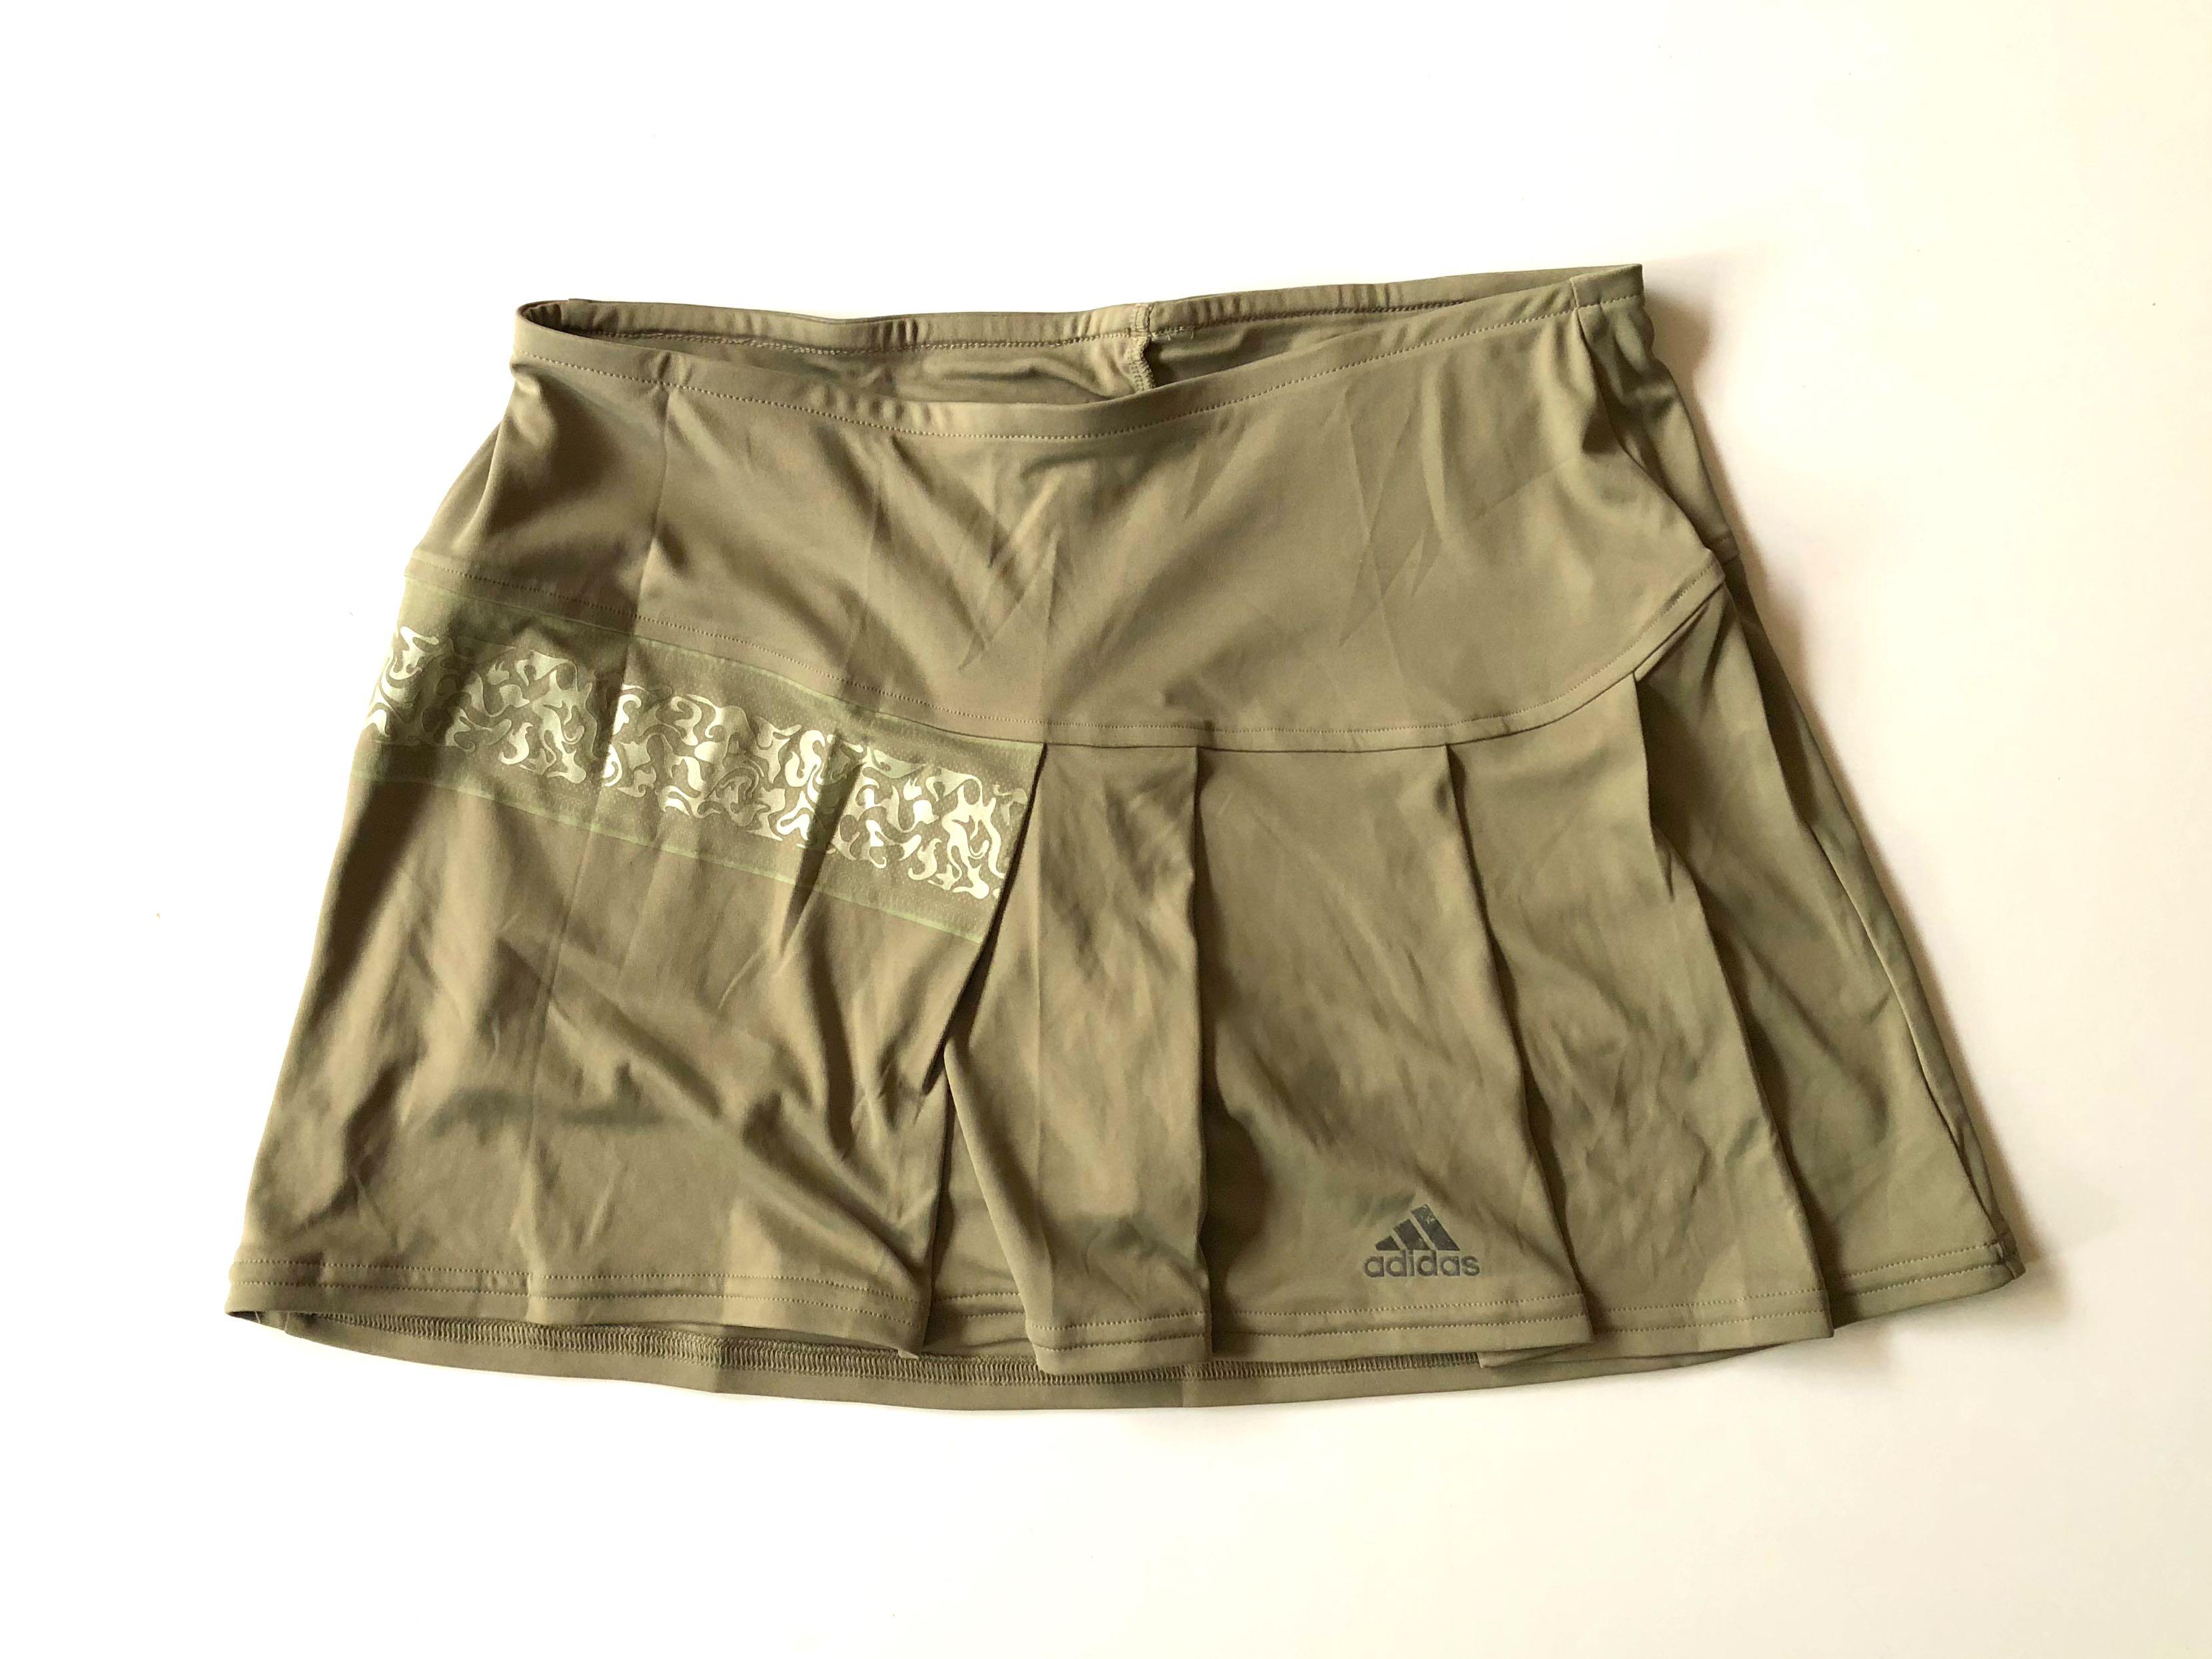 Carousell Sports Bnwt Tennis Climacool On Adidas Sports Skirt Apparel X8OO7wpxUq